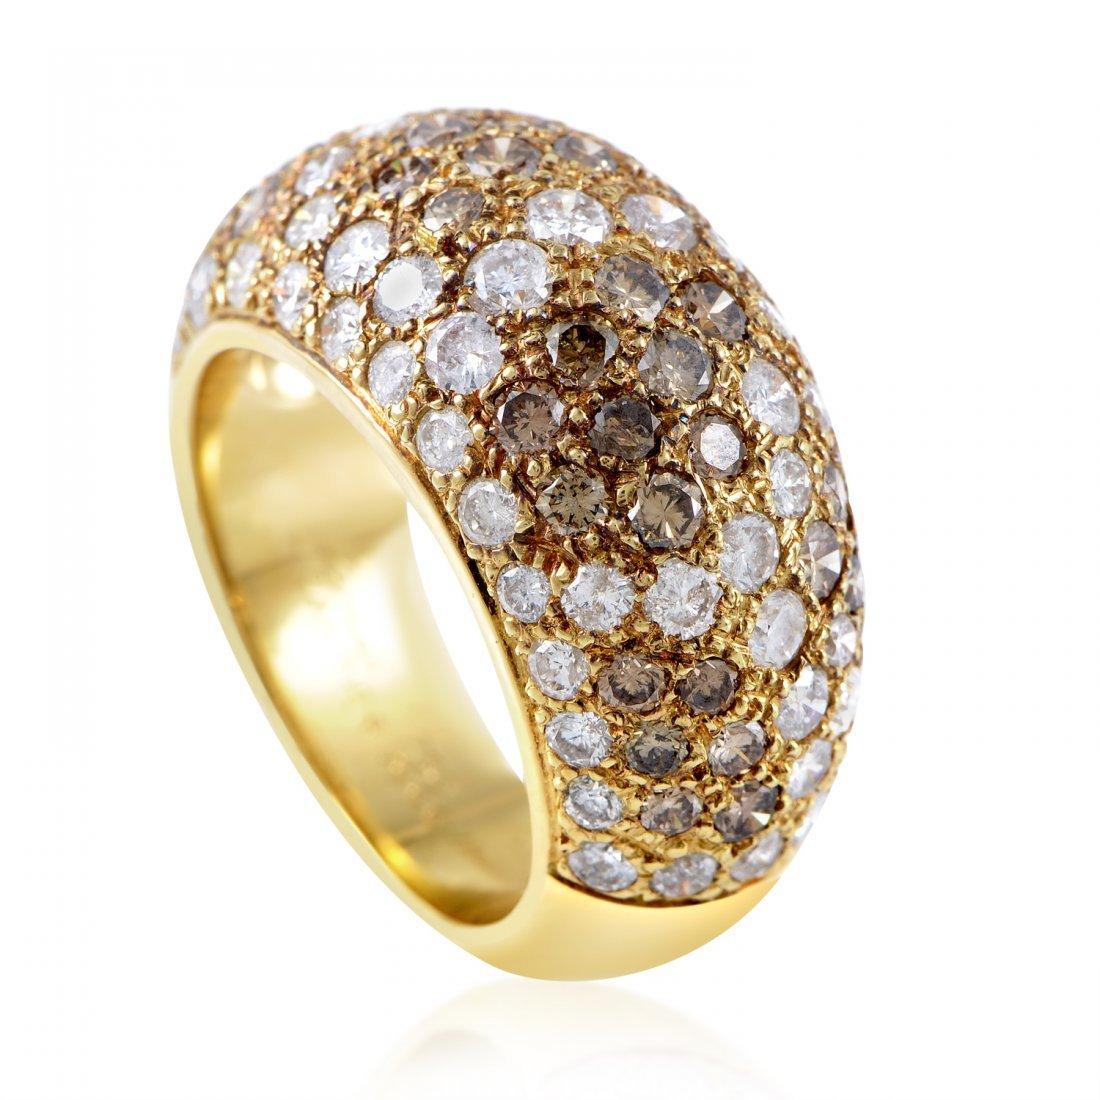 Cartier 18K Yellow Gold Multi-Diamond Ring